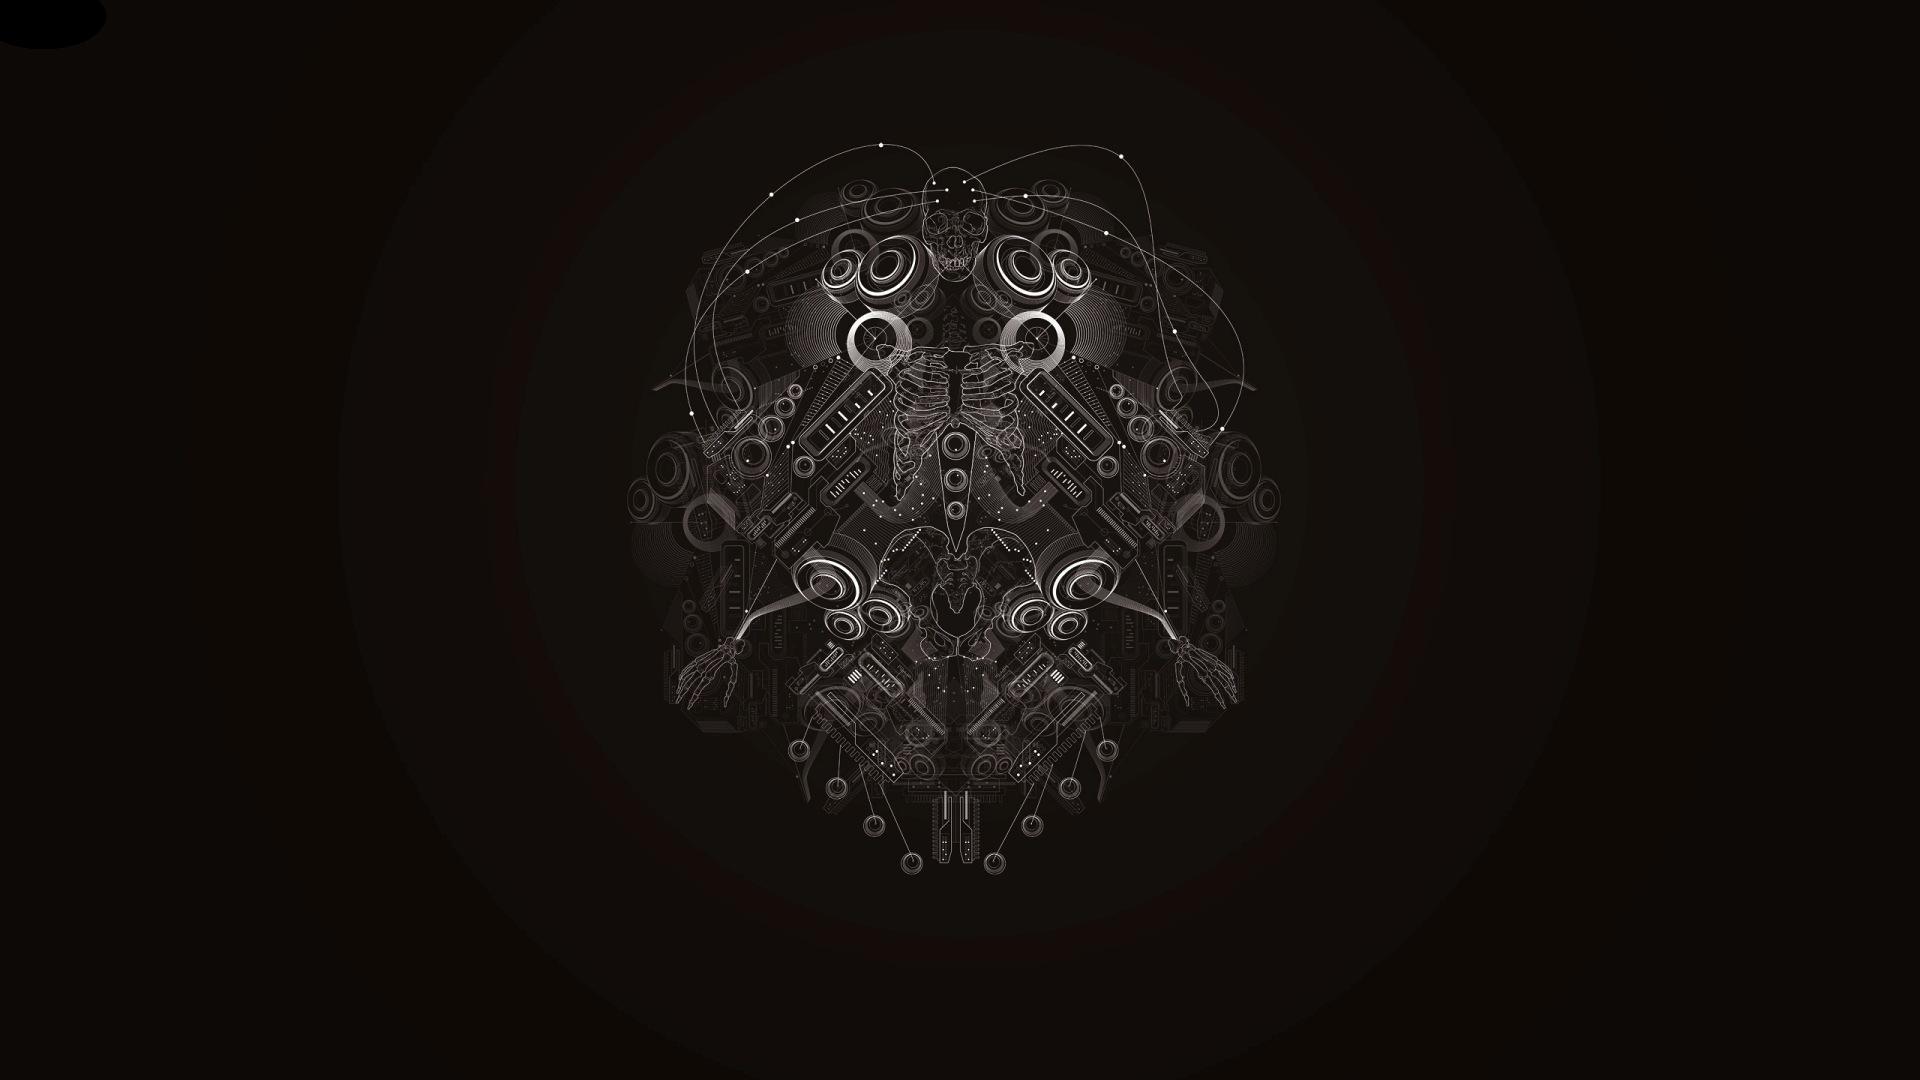 Abstract Black Background Dark Futuristic Lines Skeletons Skulls Techno